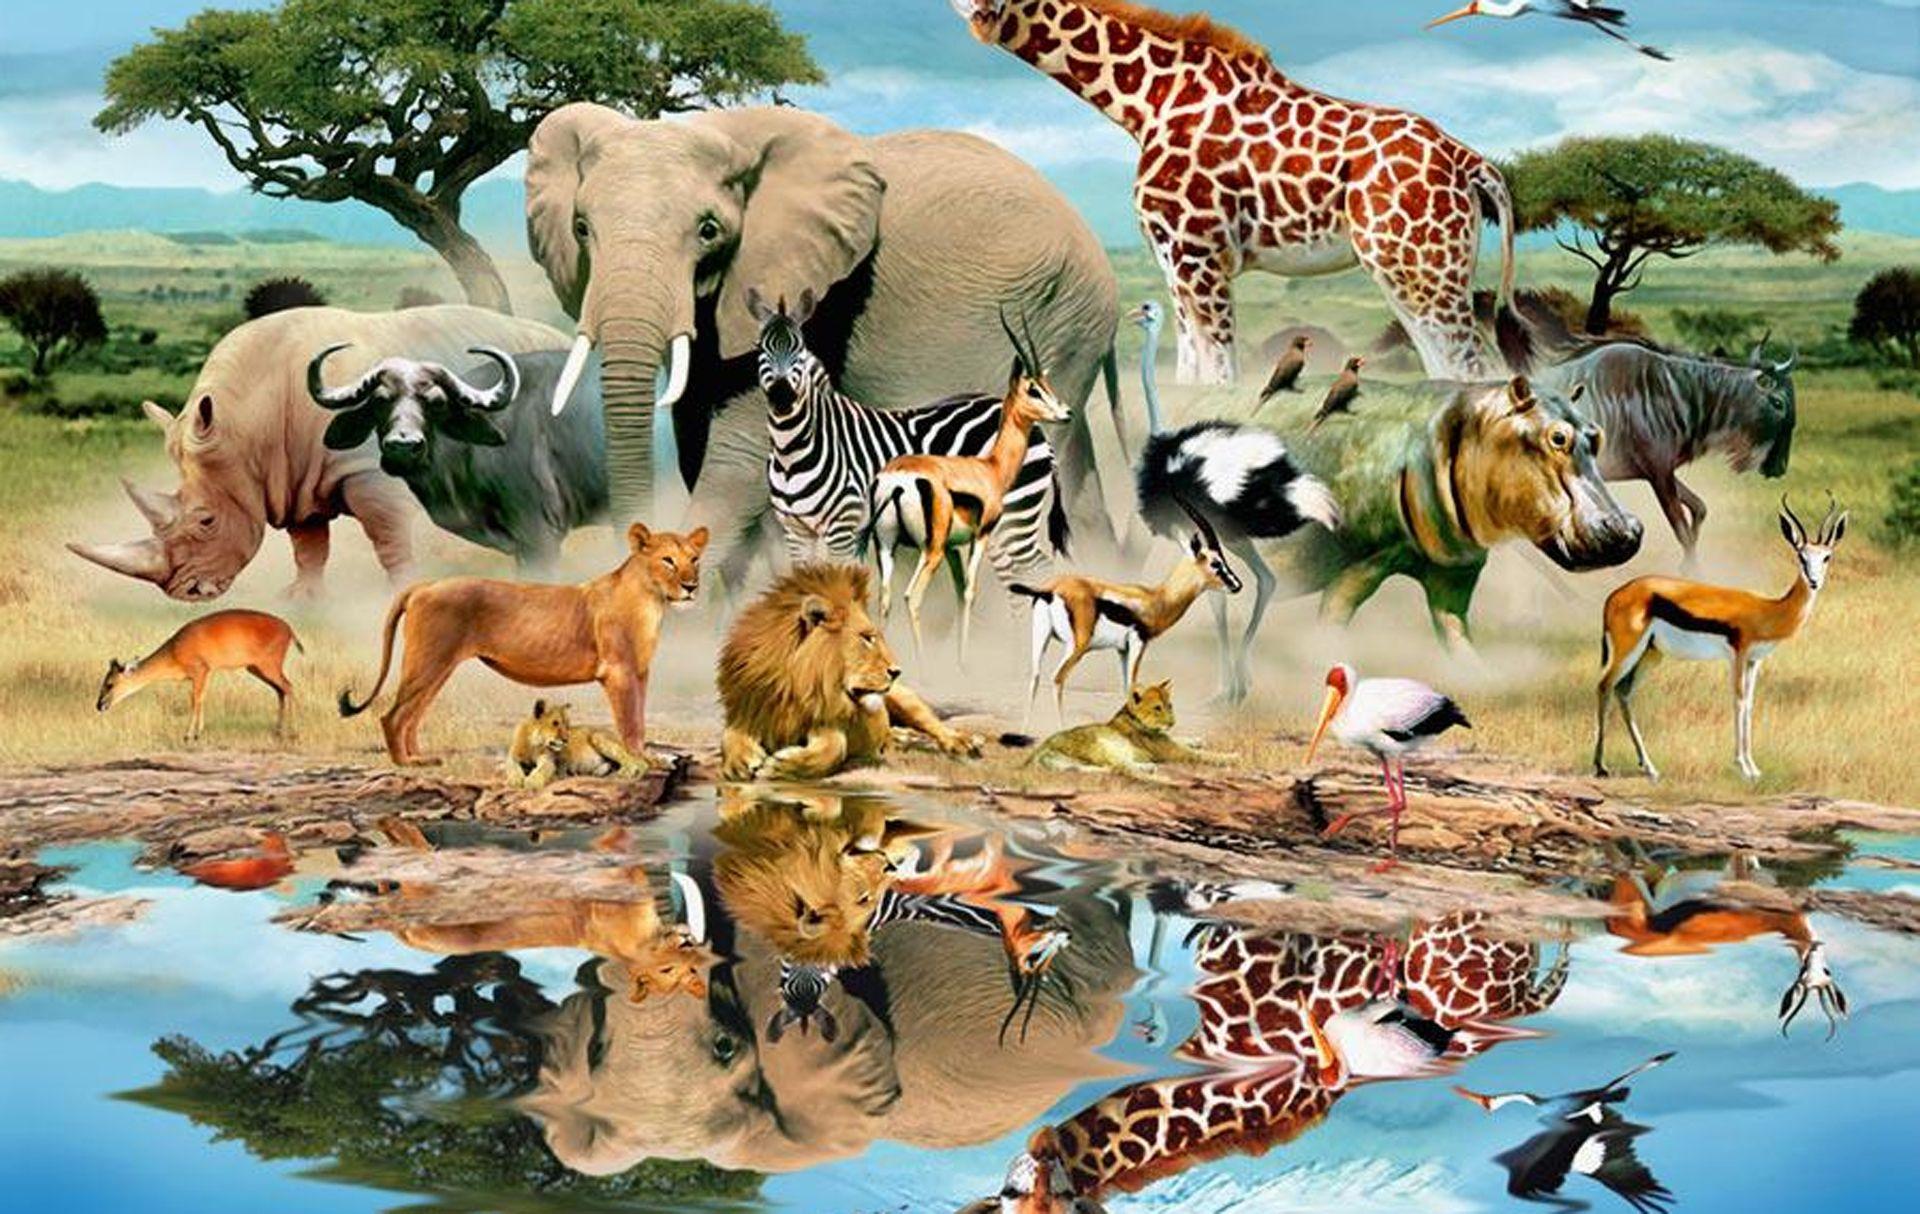 Pin by laurent verheyen on wildlife Pinterest Jehovah